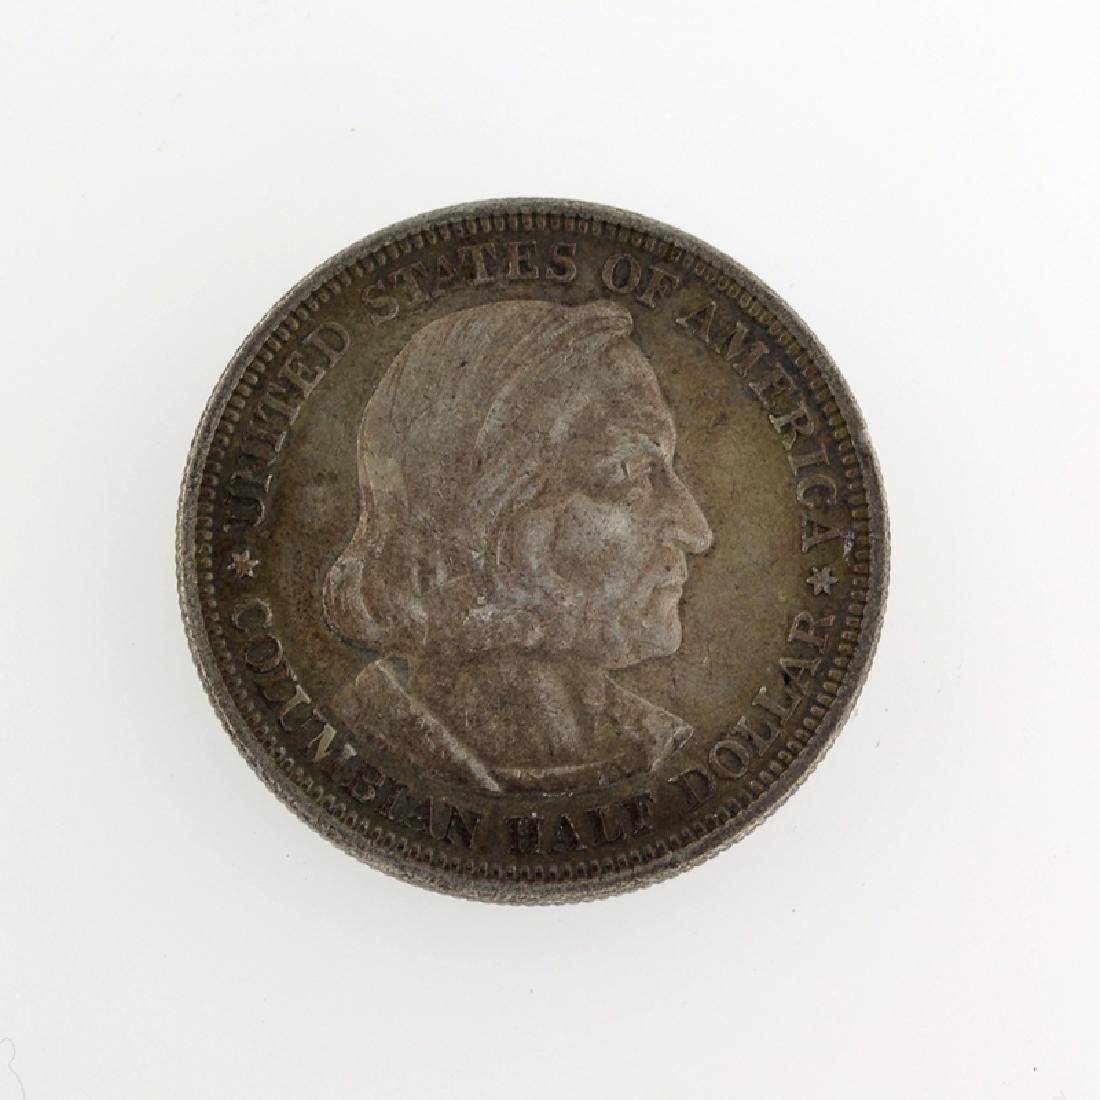 1892 Columbian Commemorative Half Dollar Coin - 2